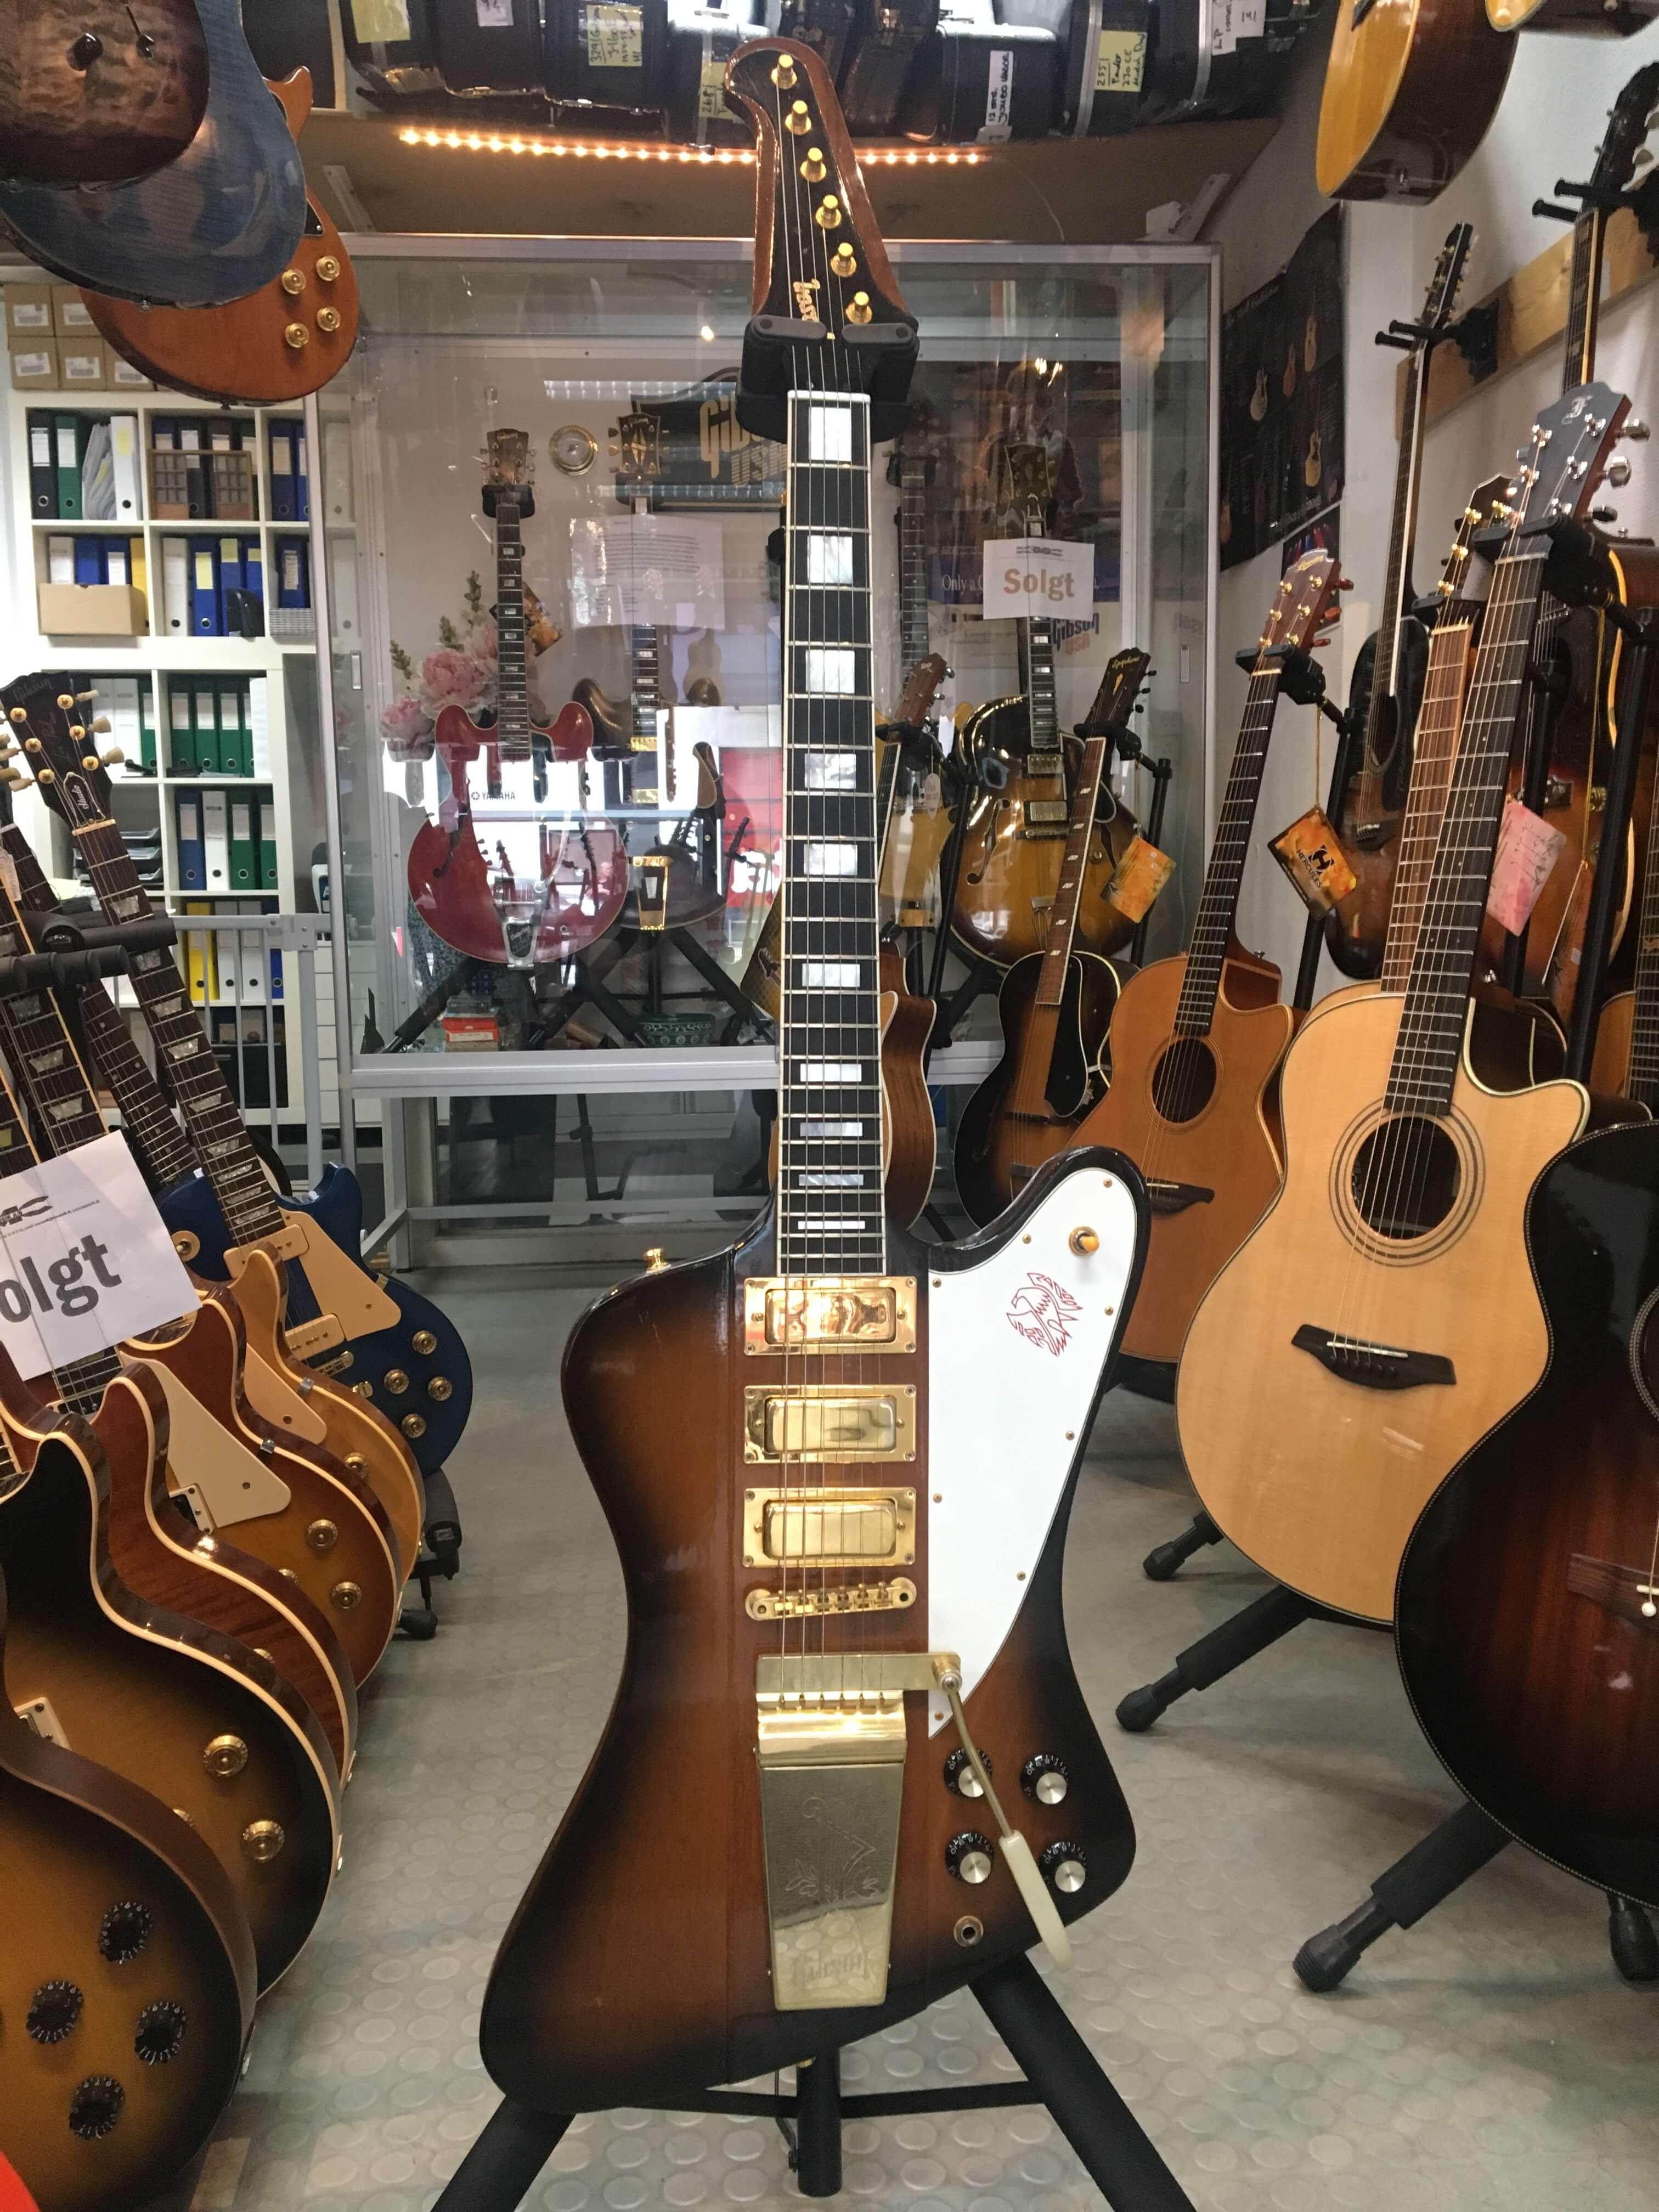 Gibson Firebird 20th Anniversary Edition, 3 PU, Lyra Vibrato, Gold